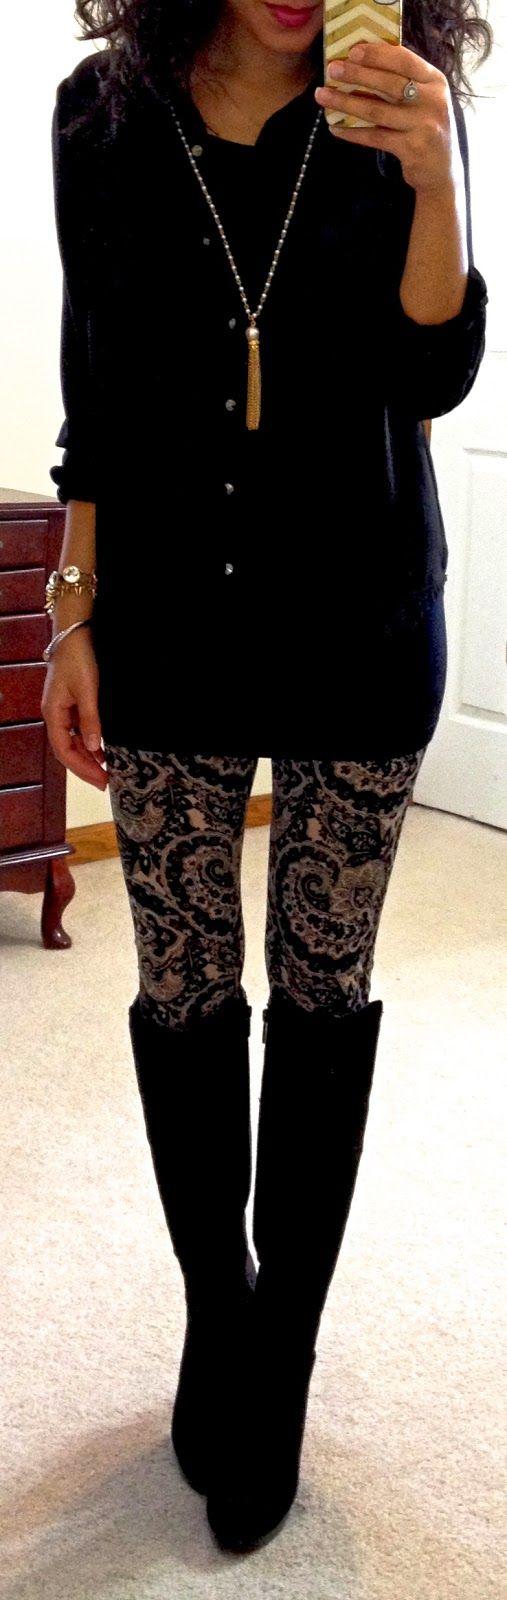 Leggings Patterned leggings and Printed leggings on Pinterest